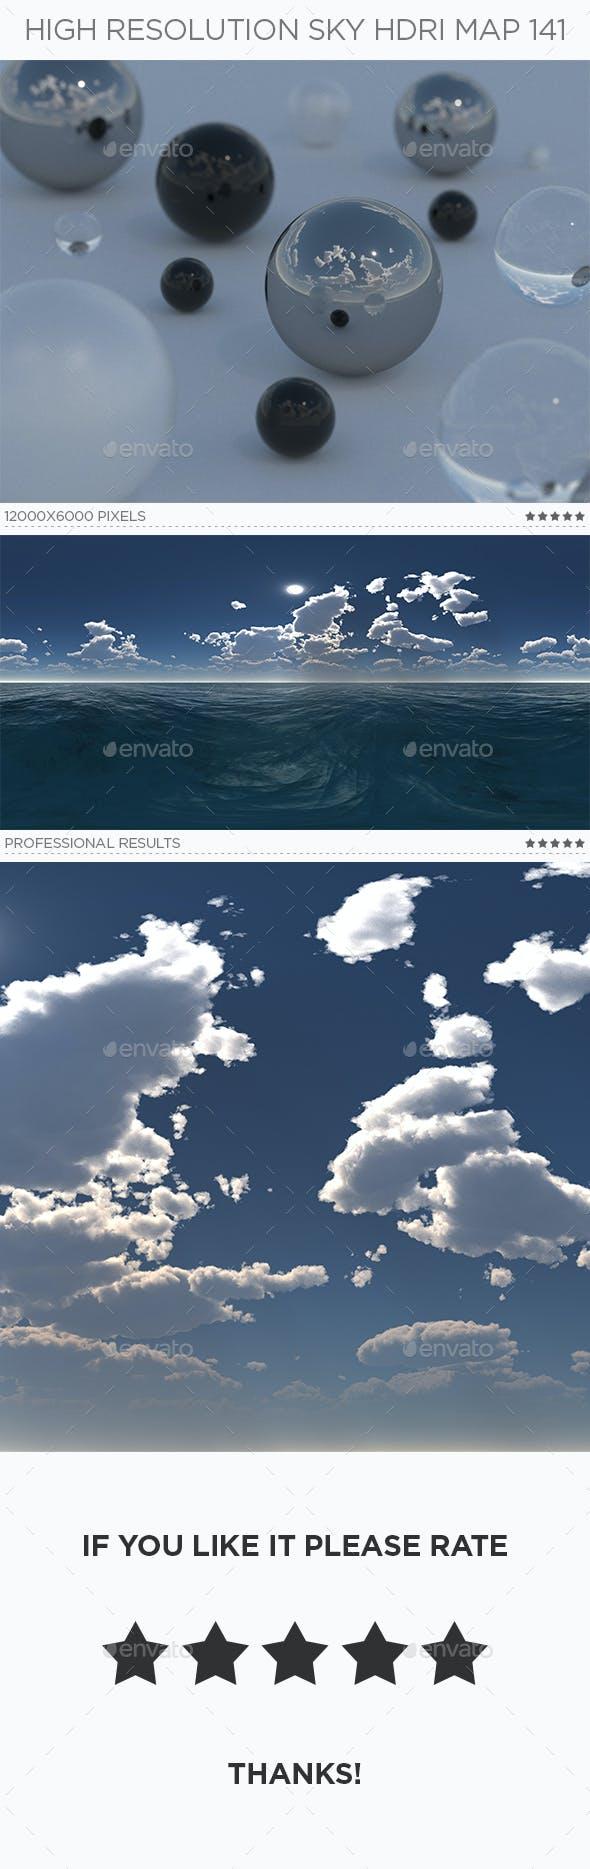 High Resolution Sky HDRi Map 141 - 3DOcean Item for Sale